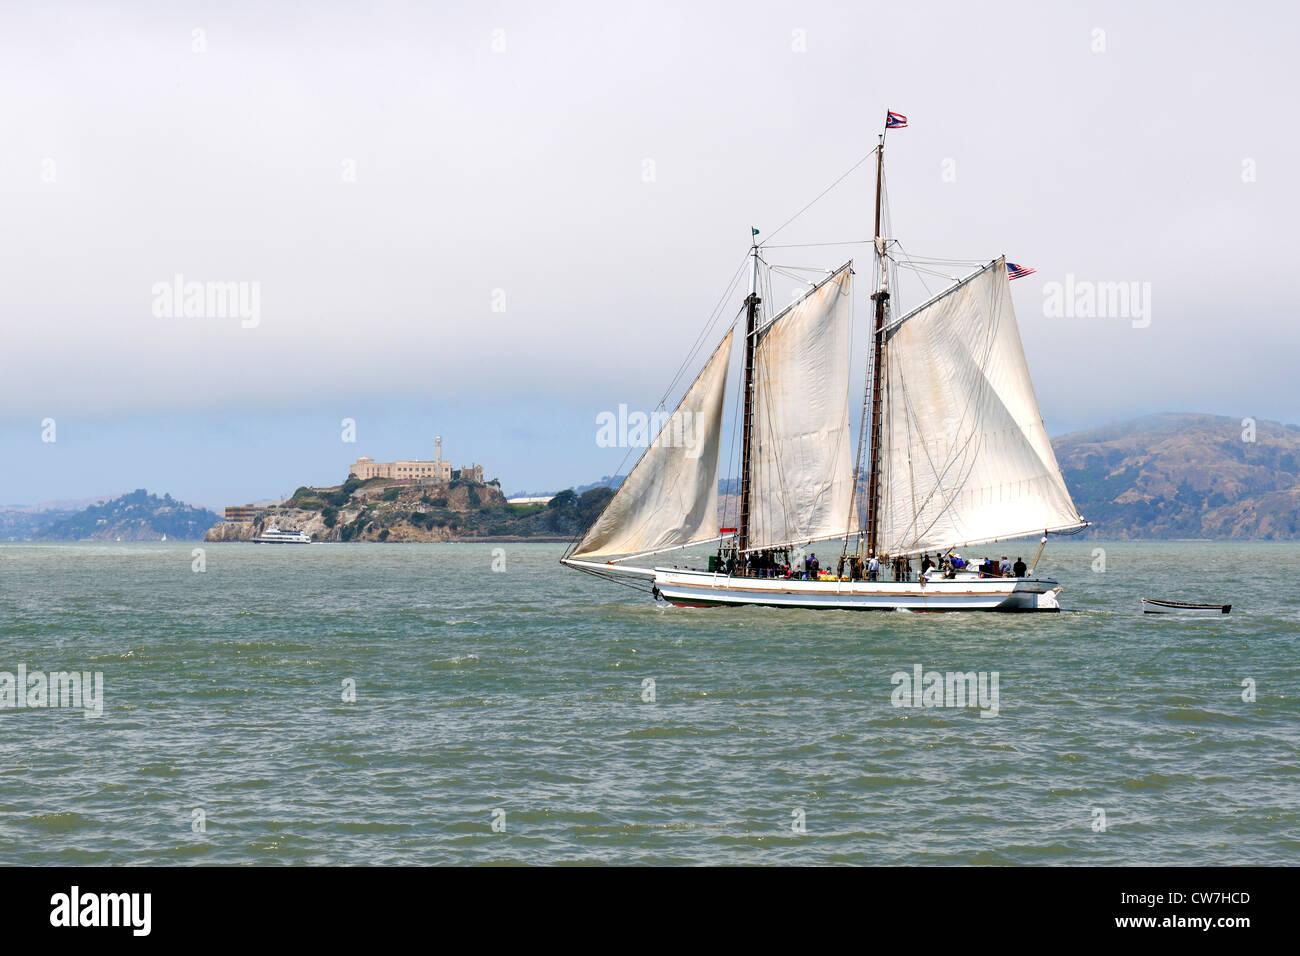 historical sailing boat in front of Alcatraz Island, USA, California, Alcatraz Island, San Francisco - Stock Image